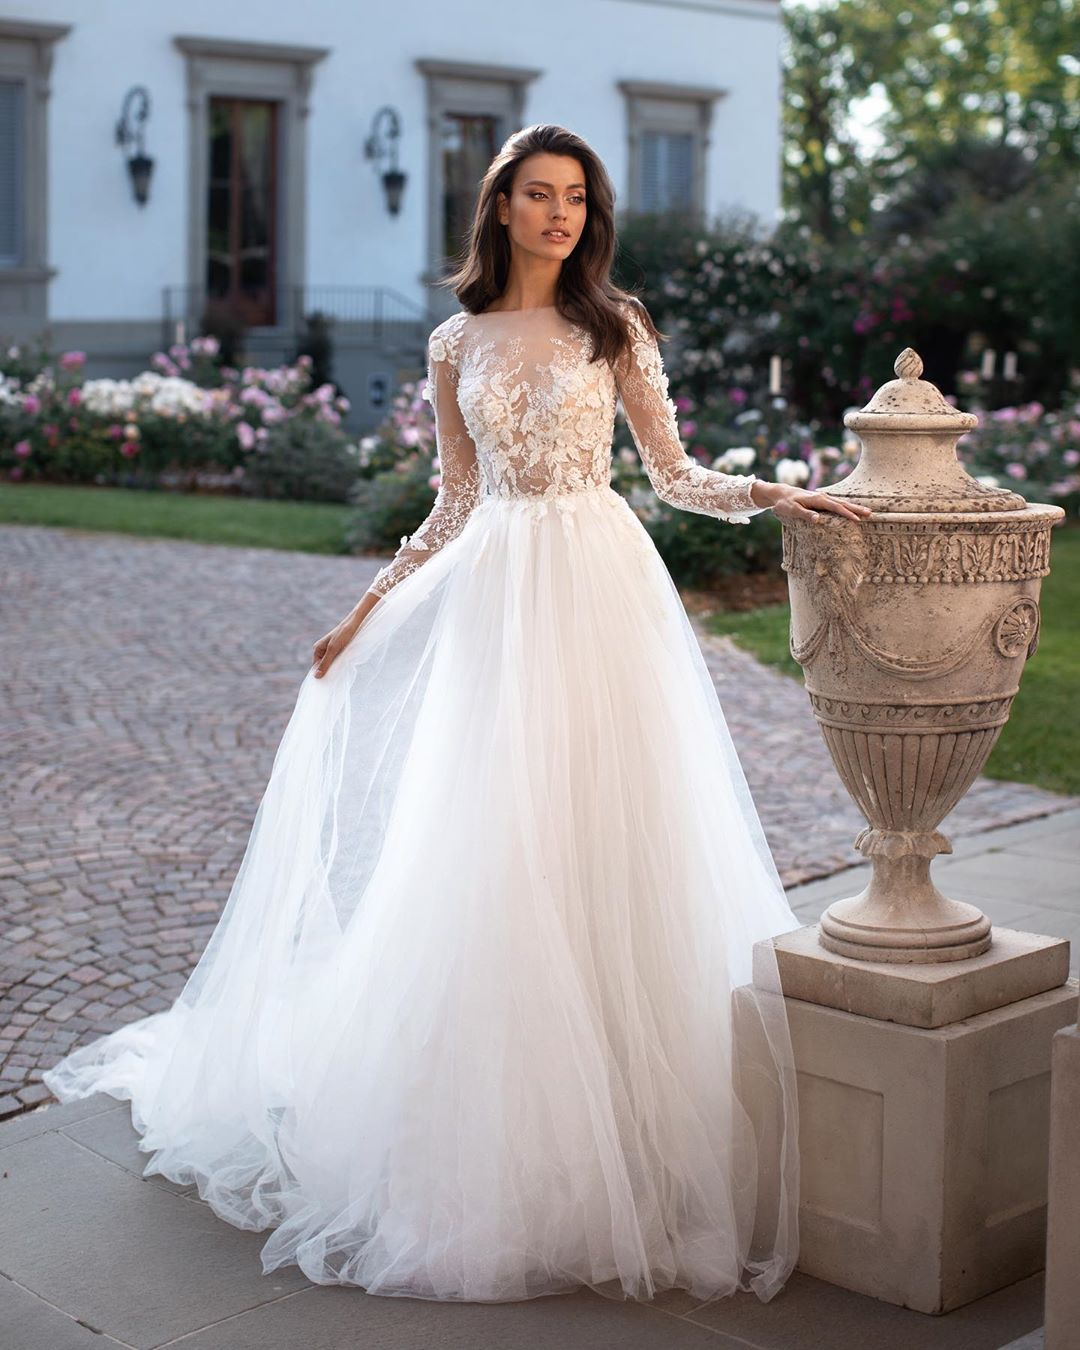 Pure Tenderness Millanova Valentina Gown Royalcollection Bridal Dresses Wedding Dresses Designer Wedding Dresses